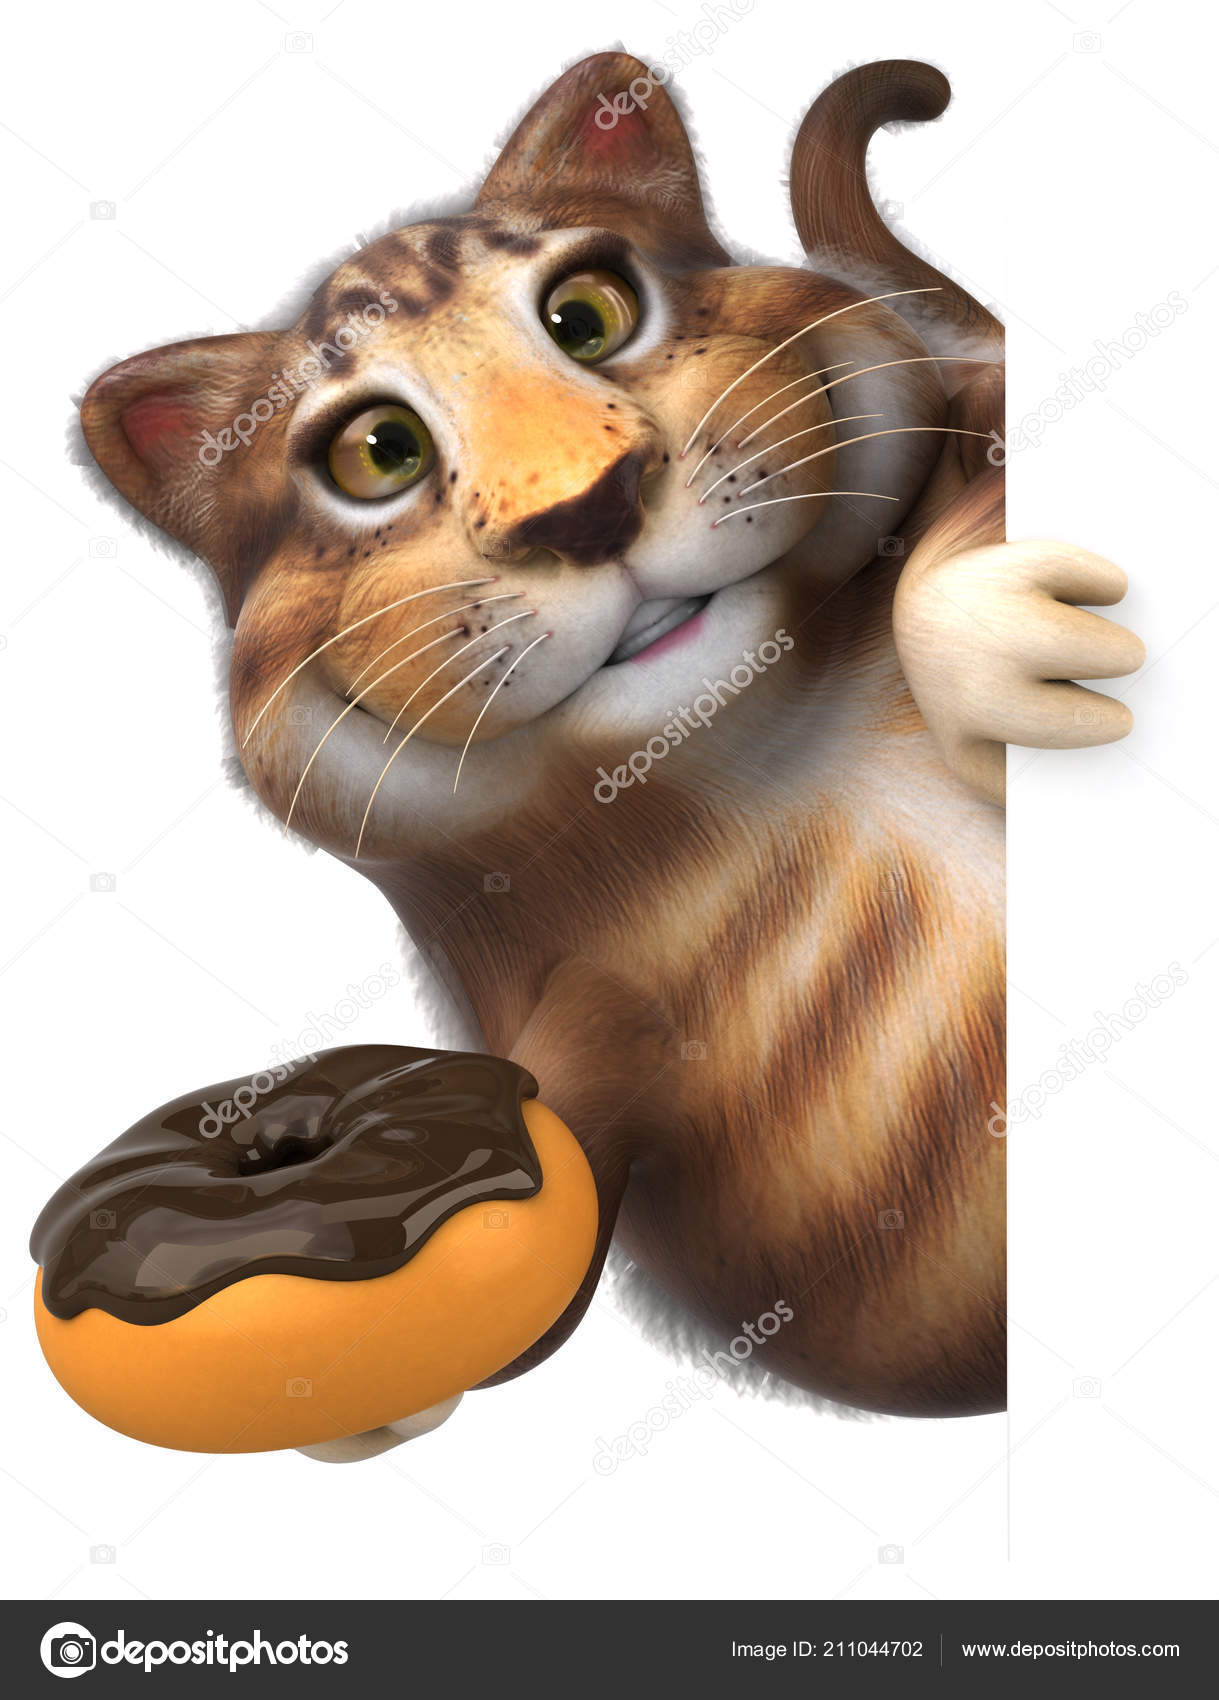 Funny Cartoon Character Avec Donut Illustration Photographie Julos